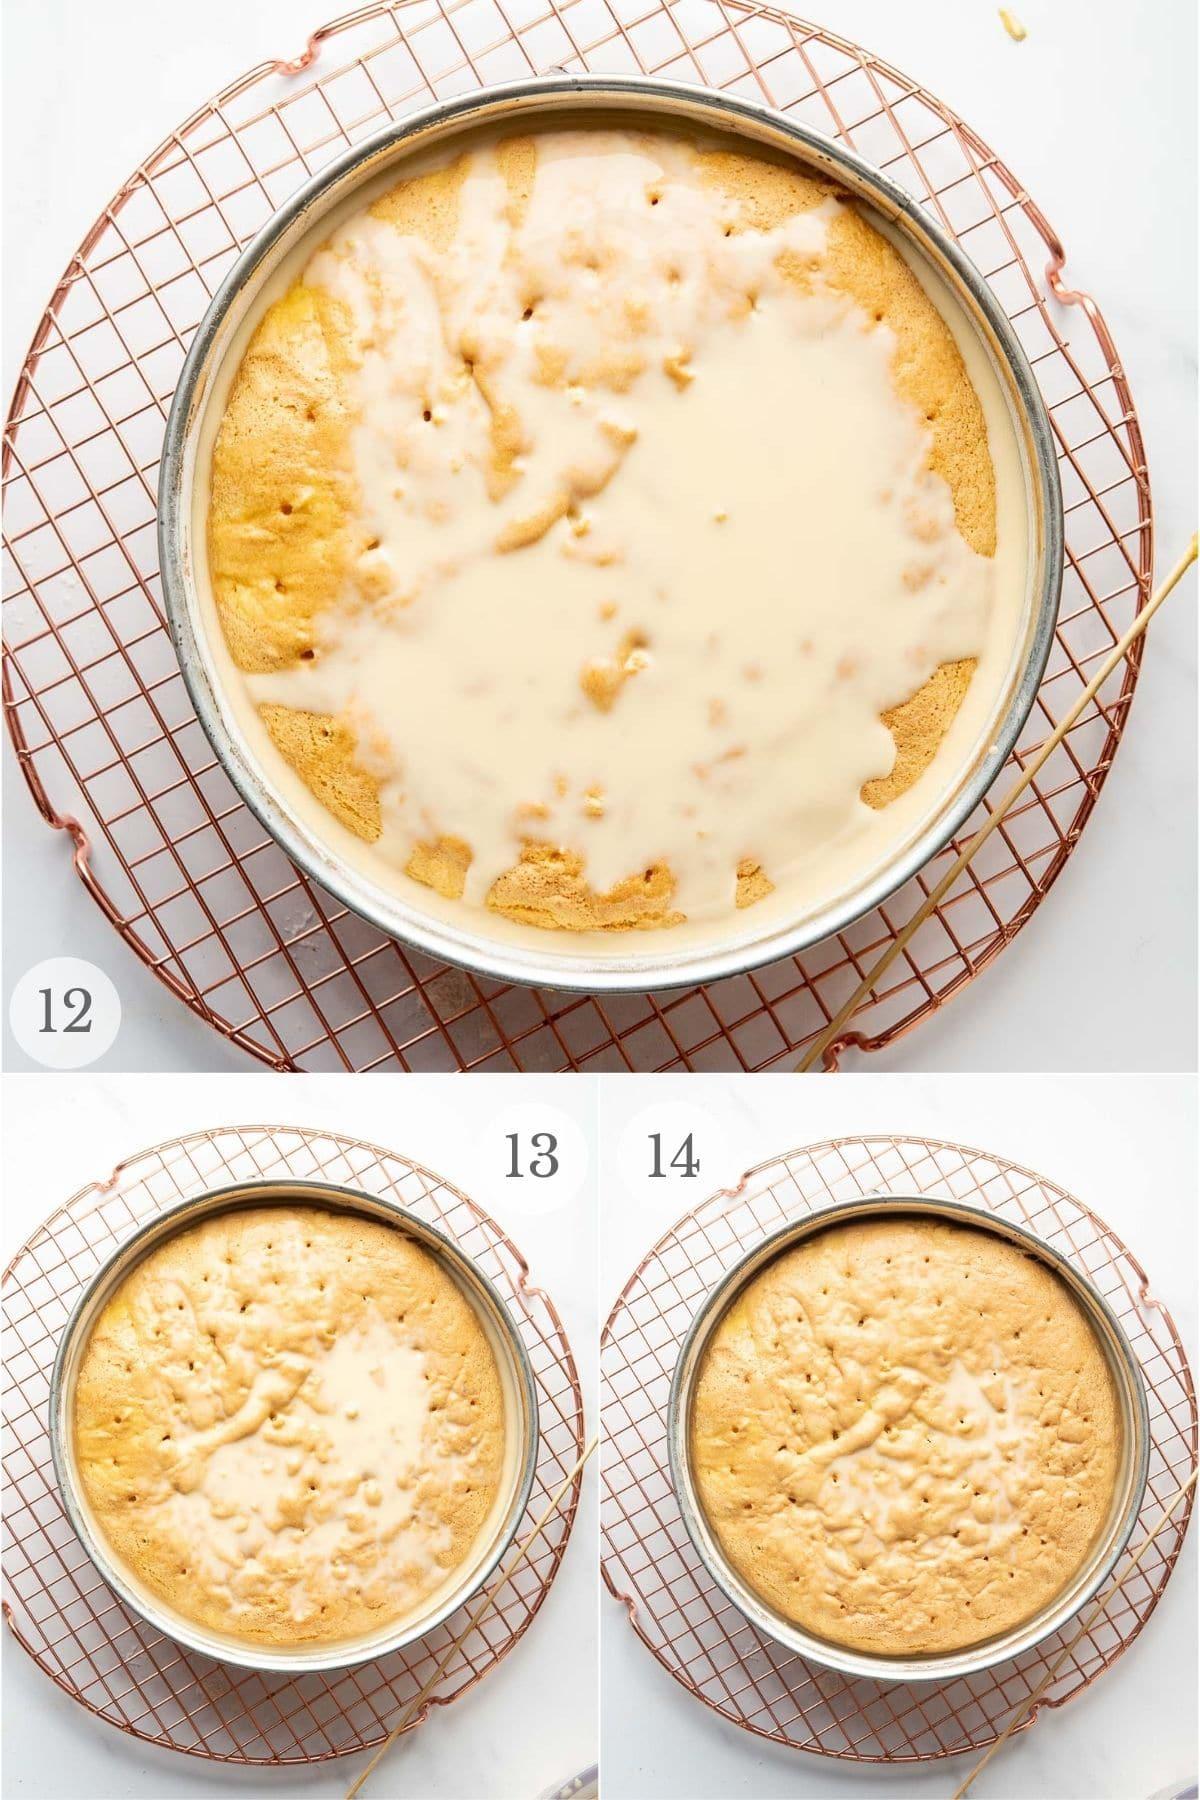 tres leches cake recipe steps 12-14